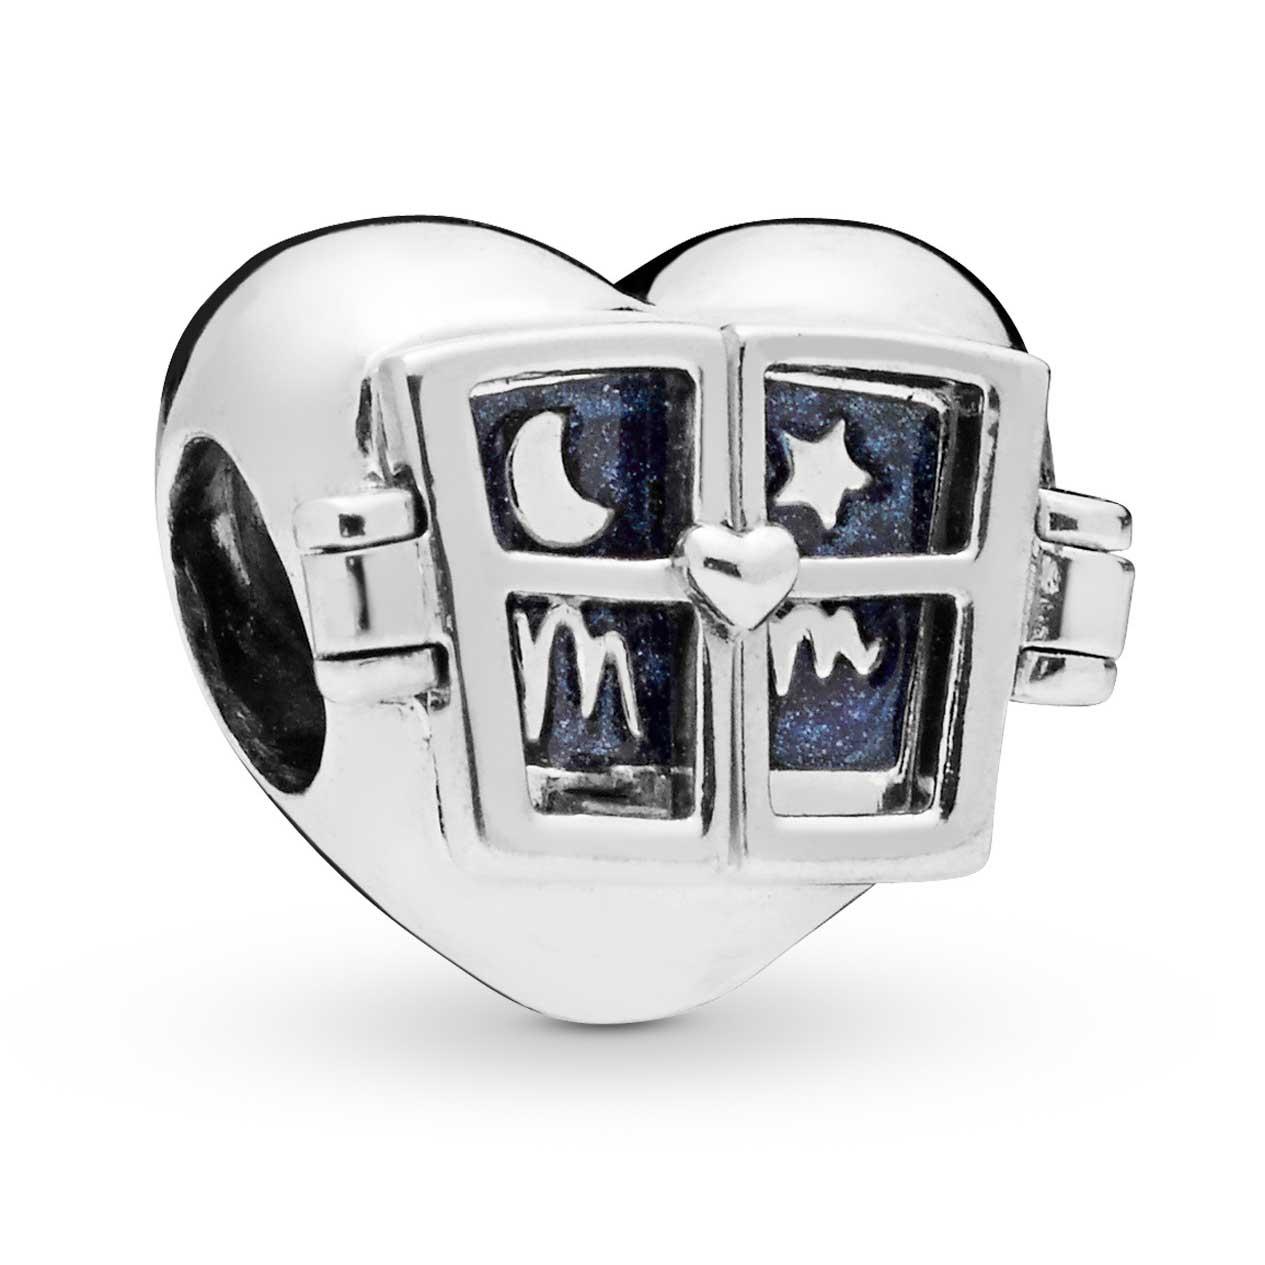 e9e55aa00 PANDORA Window Heart Charm: Precious Accents, Ltd.